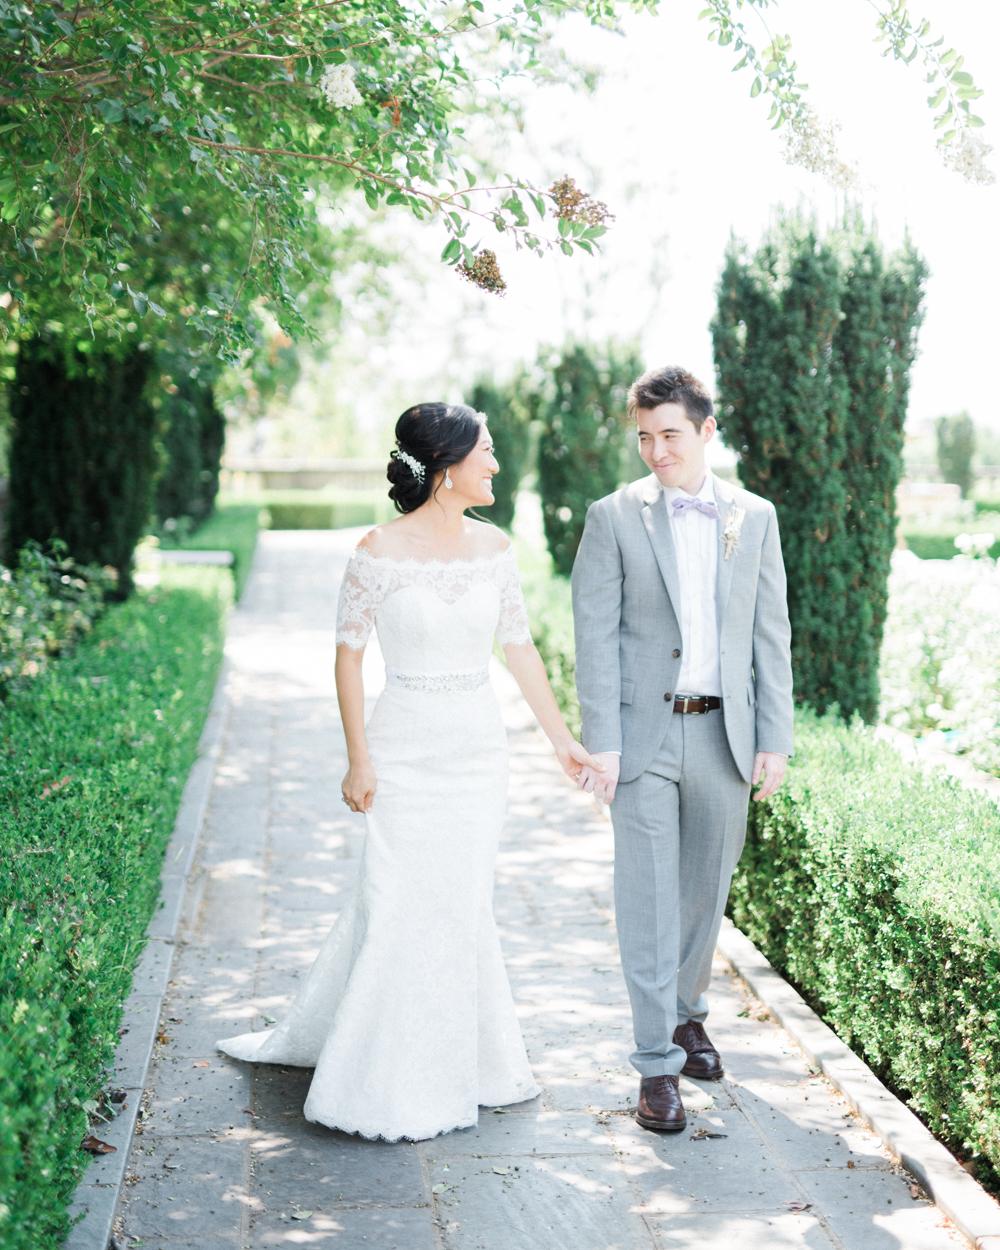 AKP_Greystone_Mansion_Wedding_Fine_Art_Film_Wedding_Photographer-9.jpg